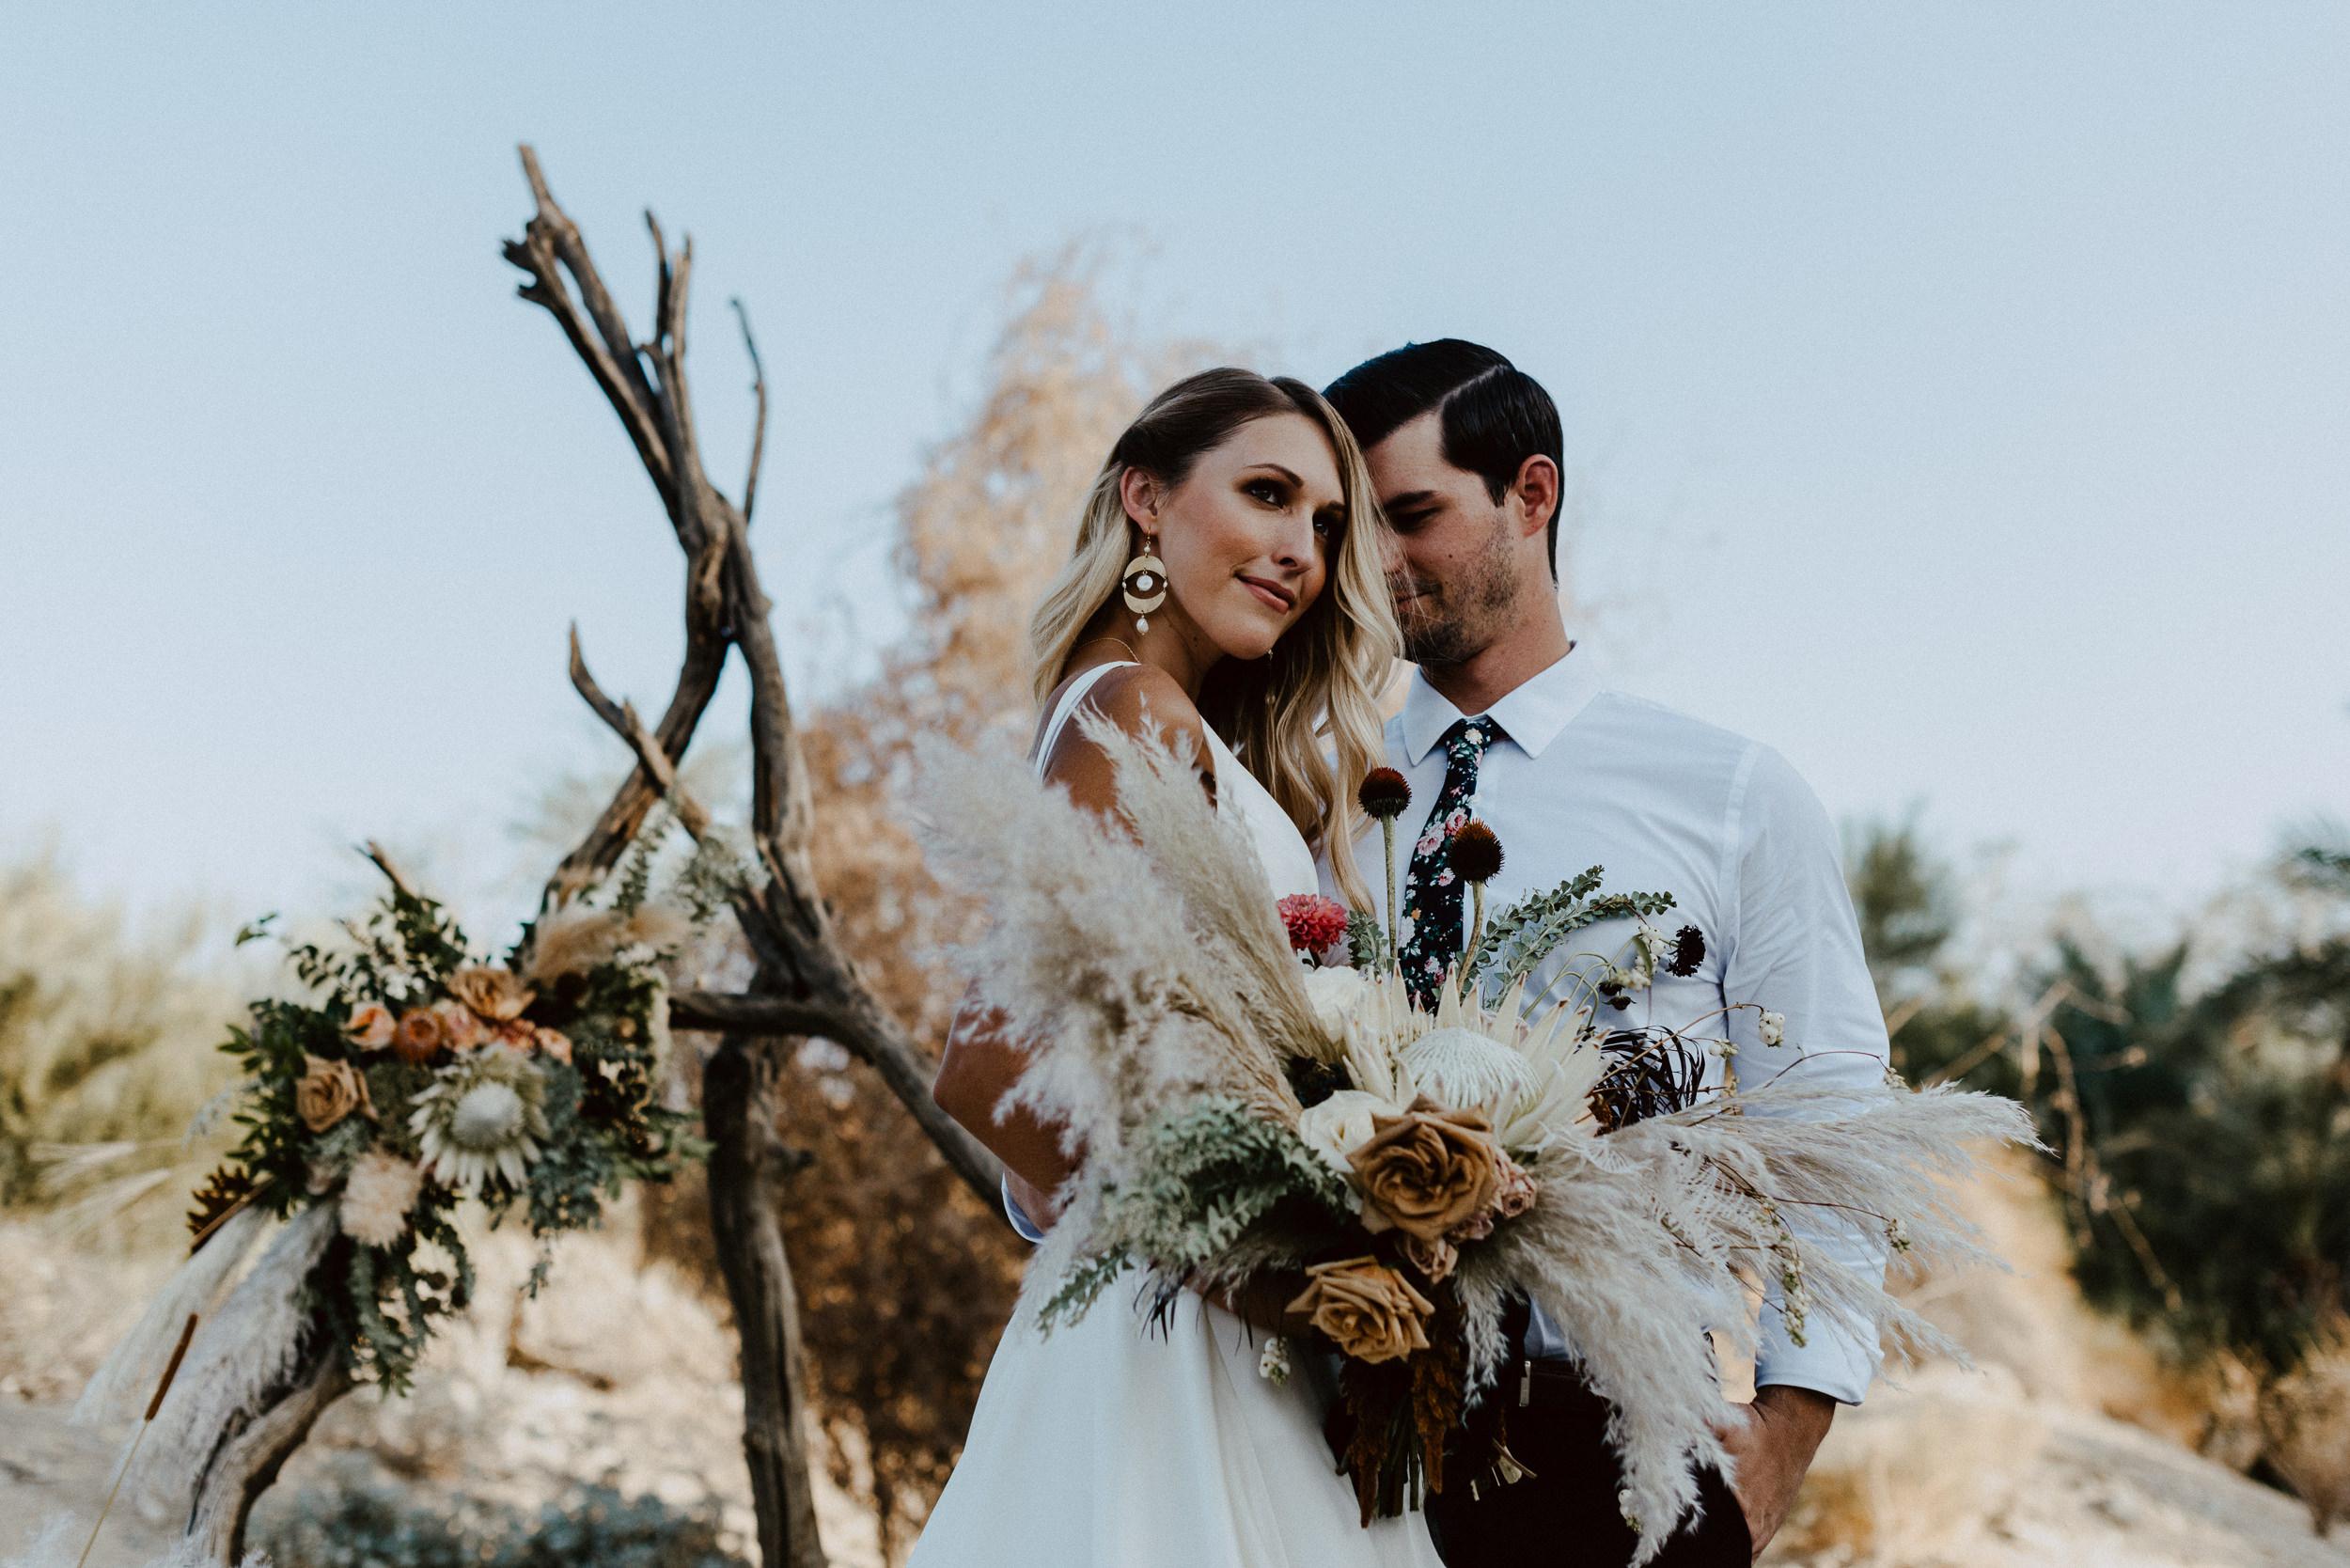 sChelsie + Chris - The Desert Shootout Wedding Romantics at The Living Desert-49.jpg